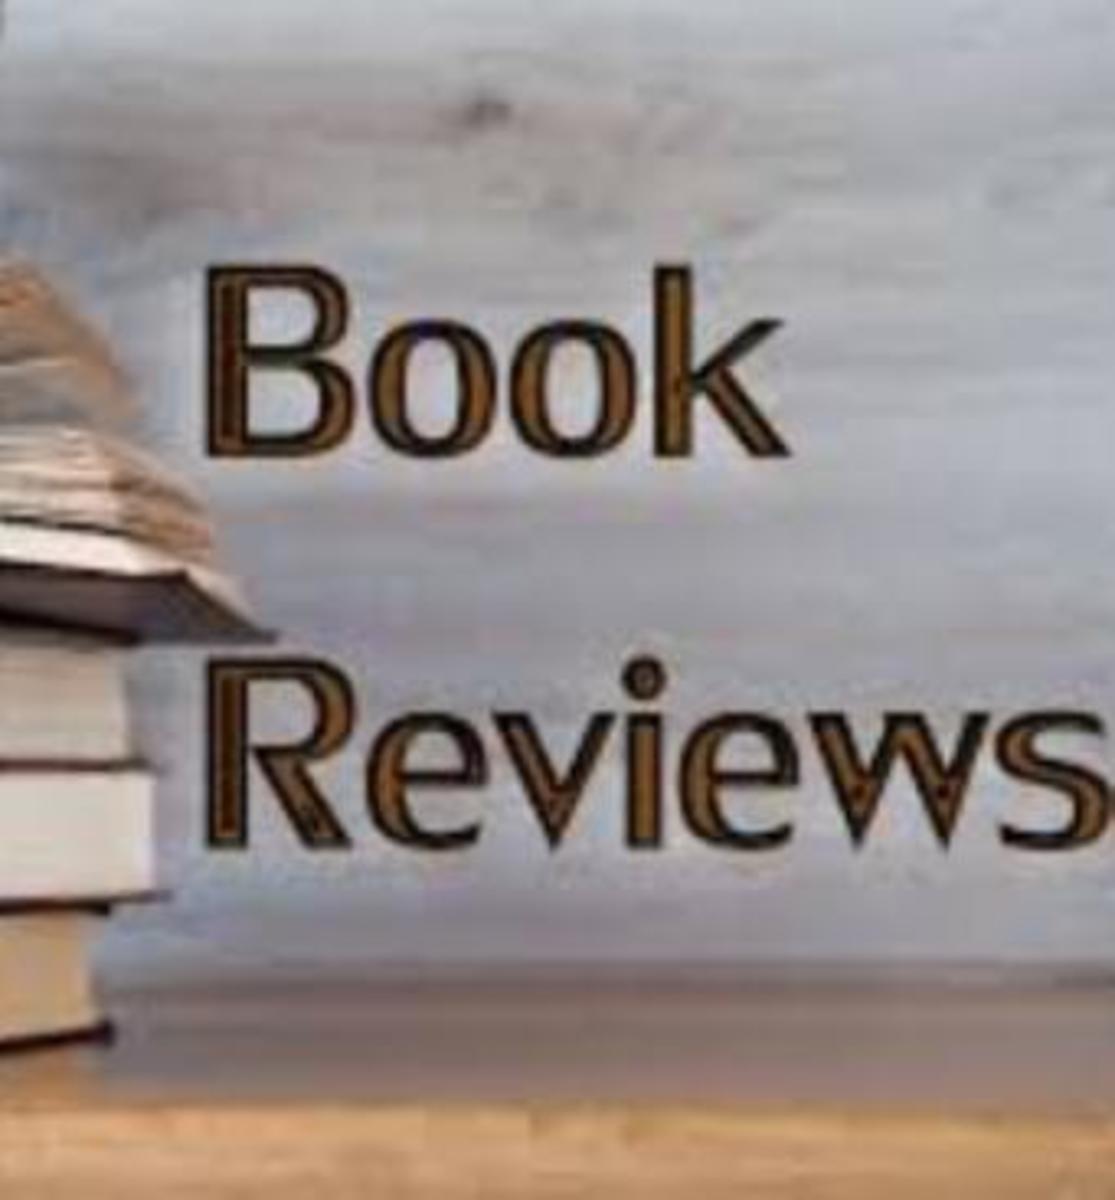 Love Book Reviews?